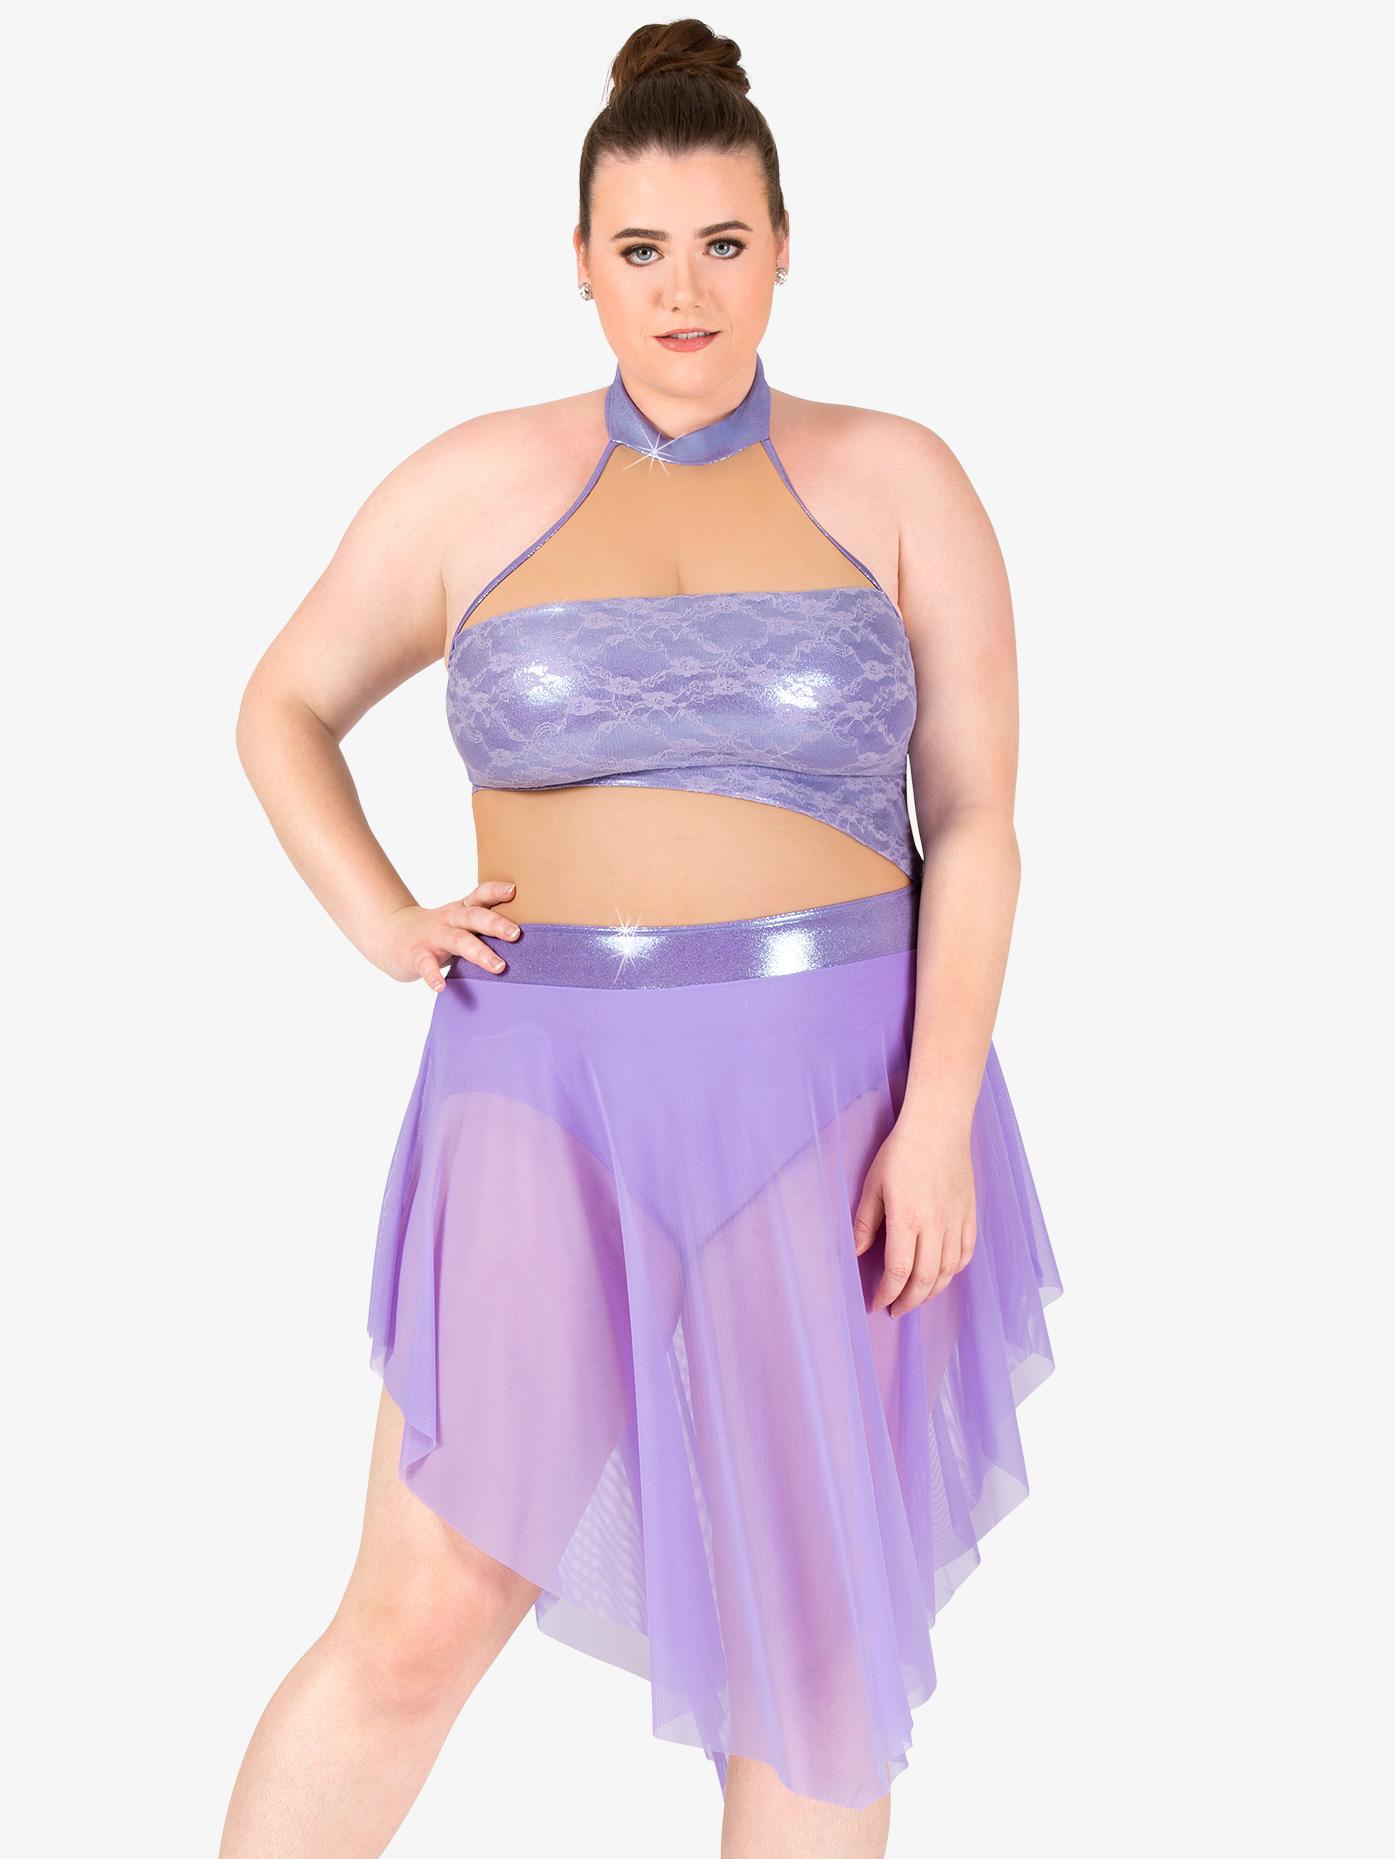 Elisse by Double Platinum Womens Plus Size High Neck Metallic Lyrical Dress N7476P